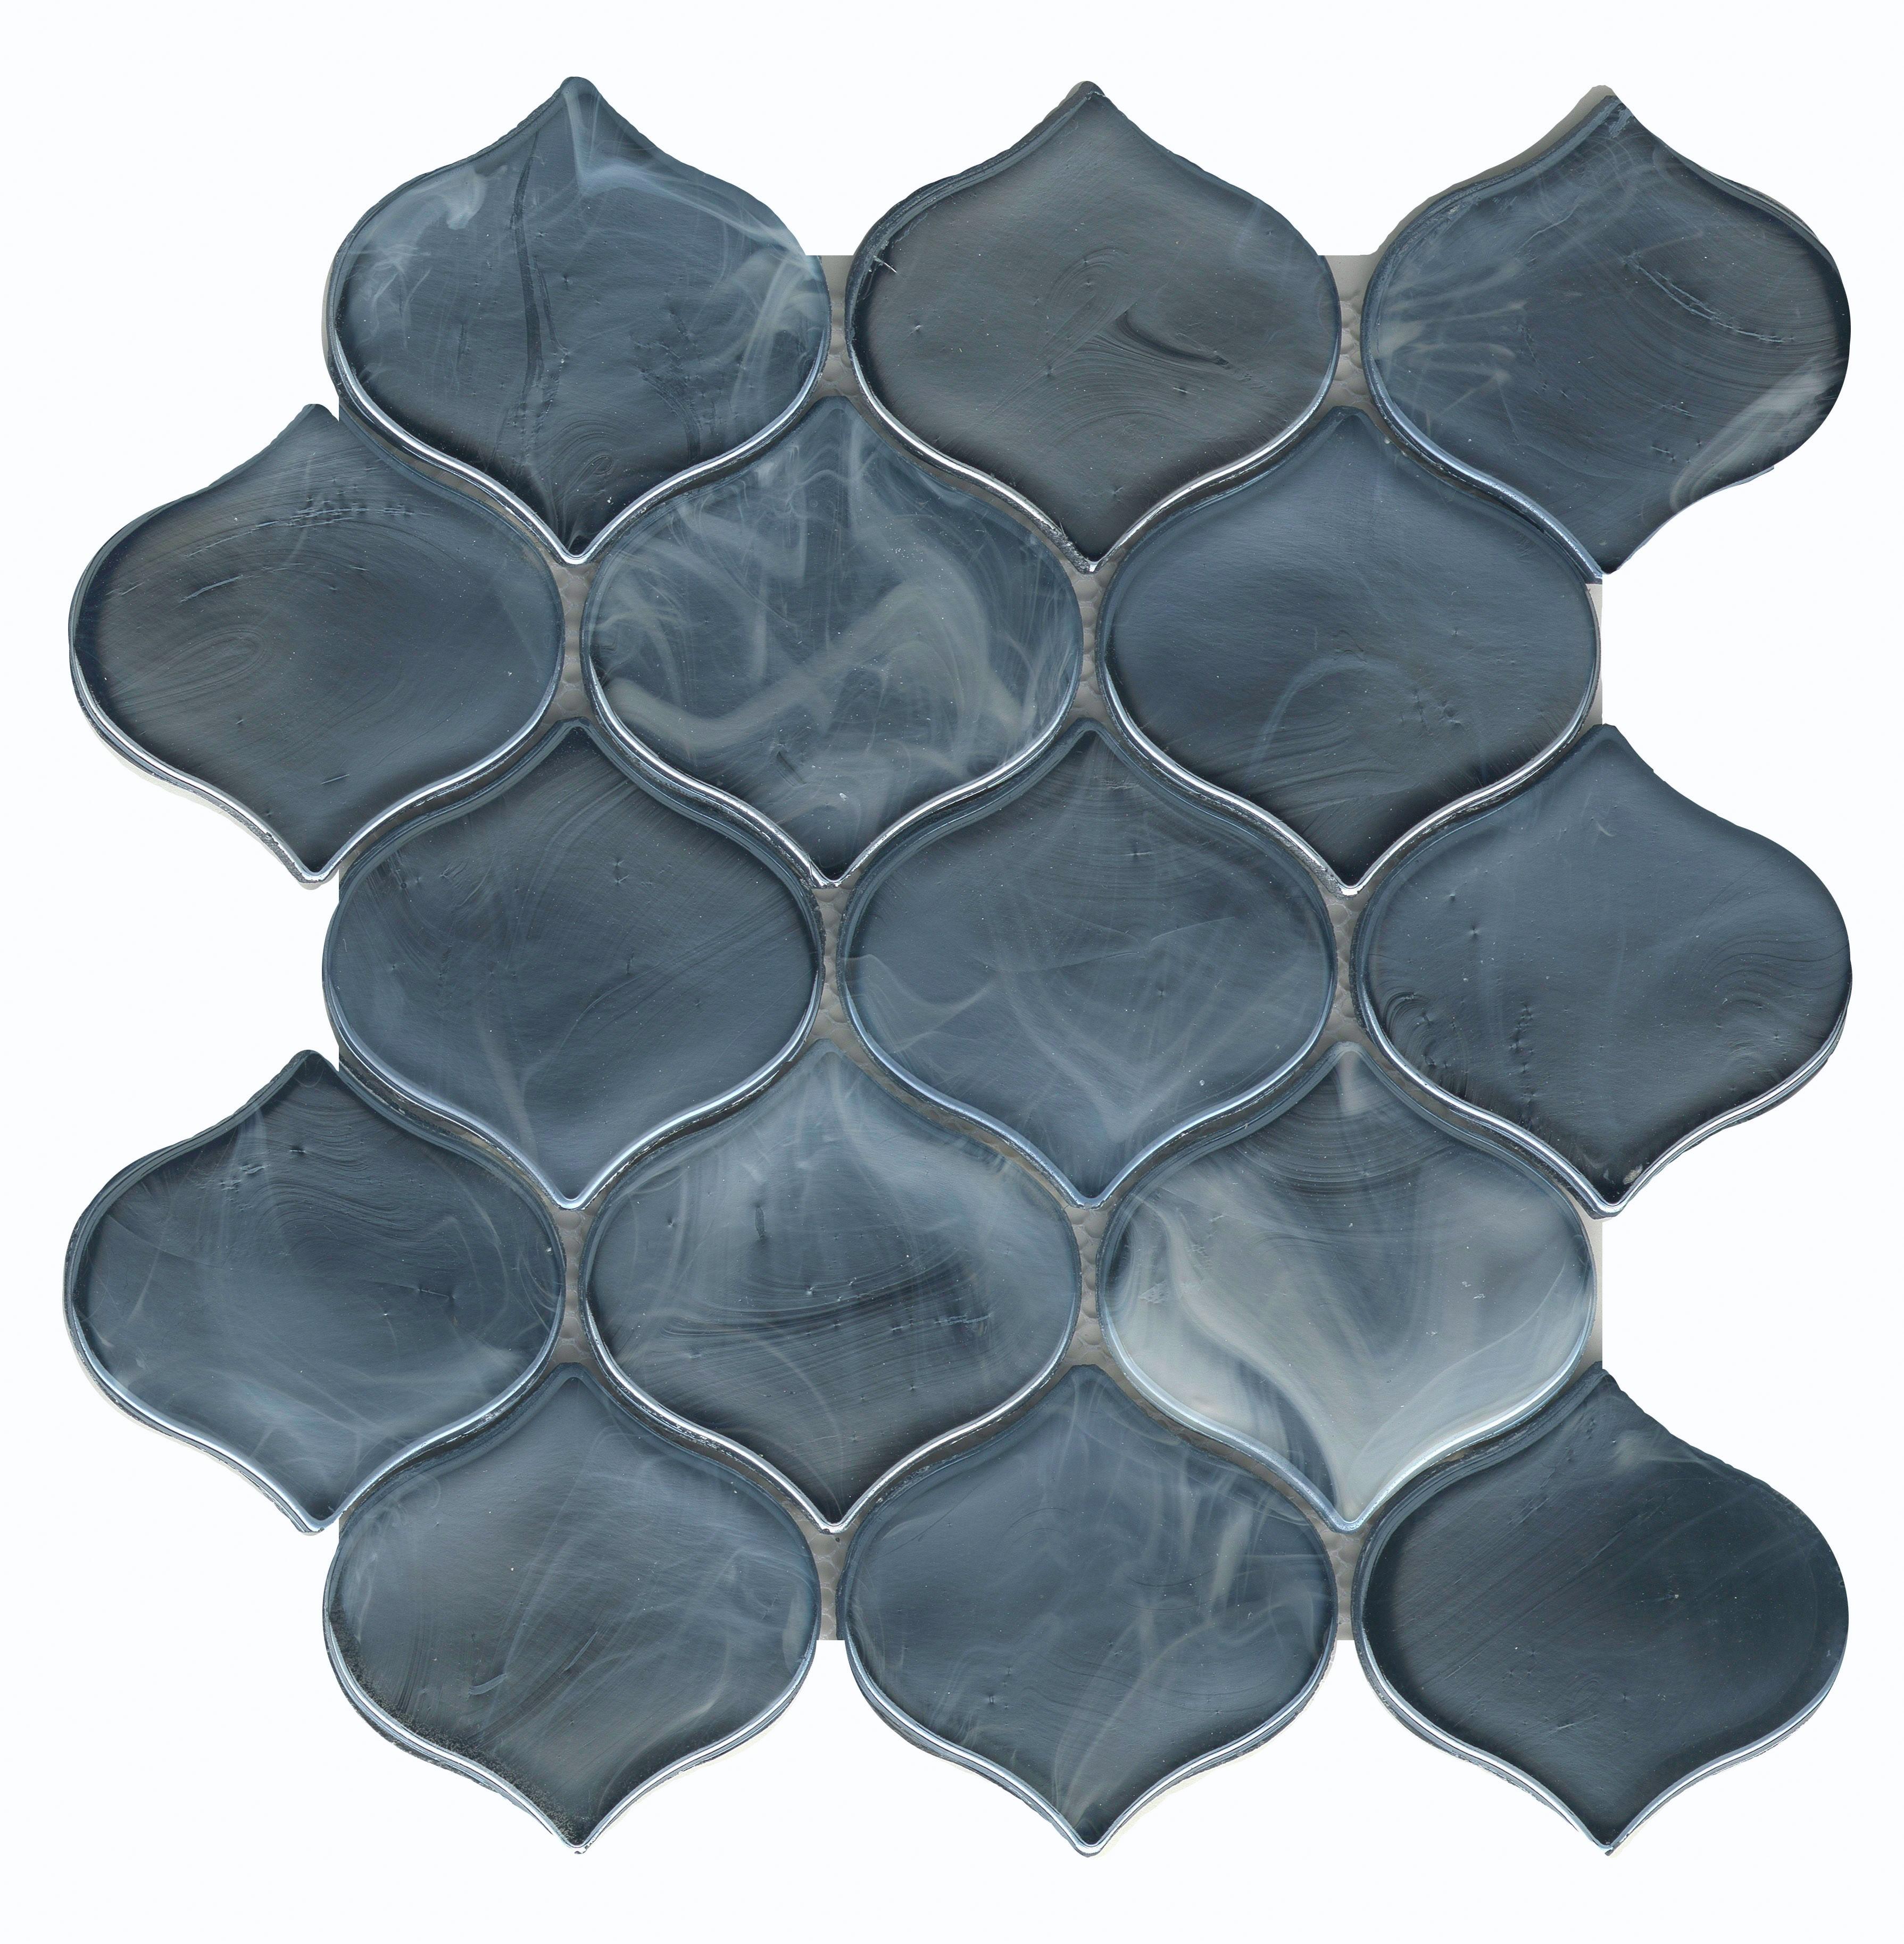 new emser tile products based on